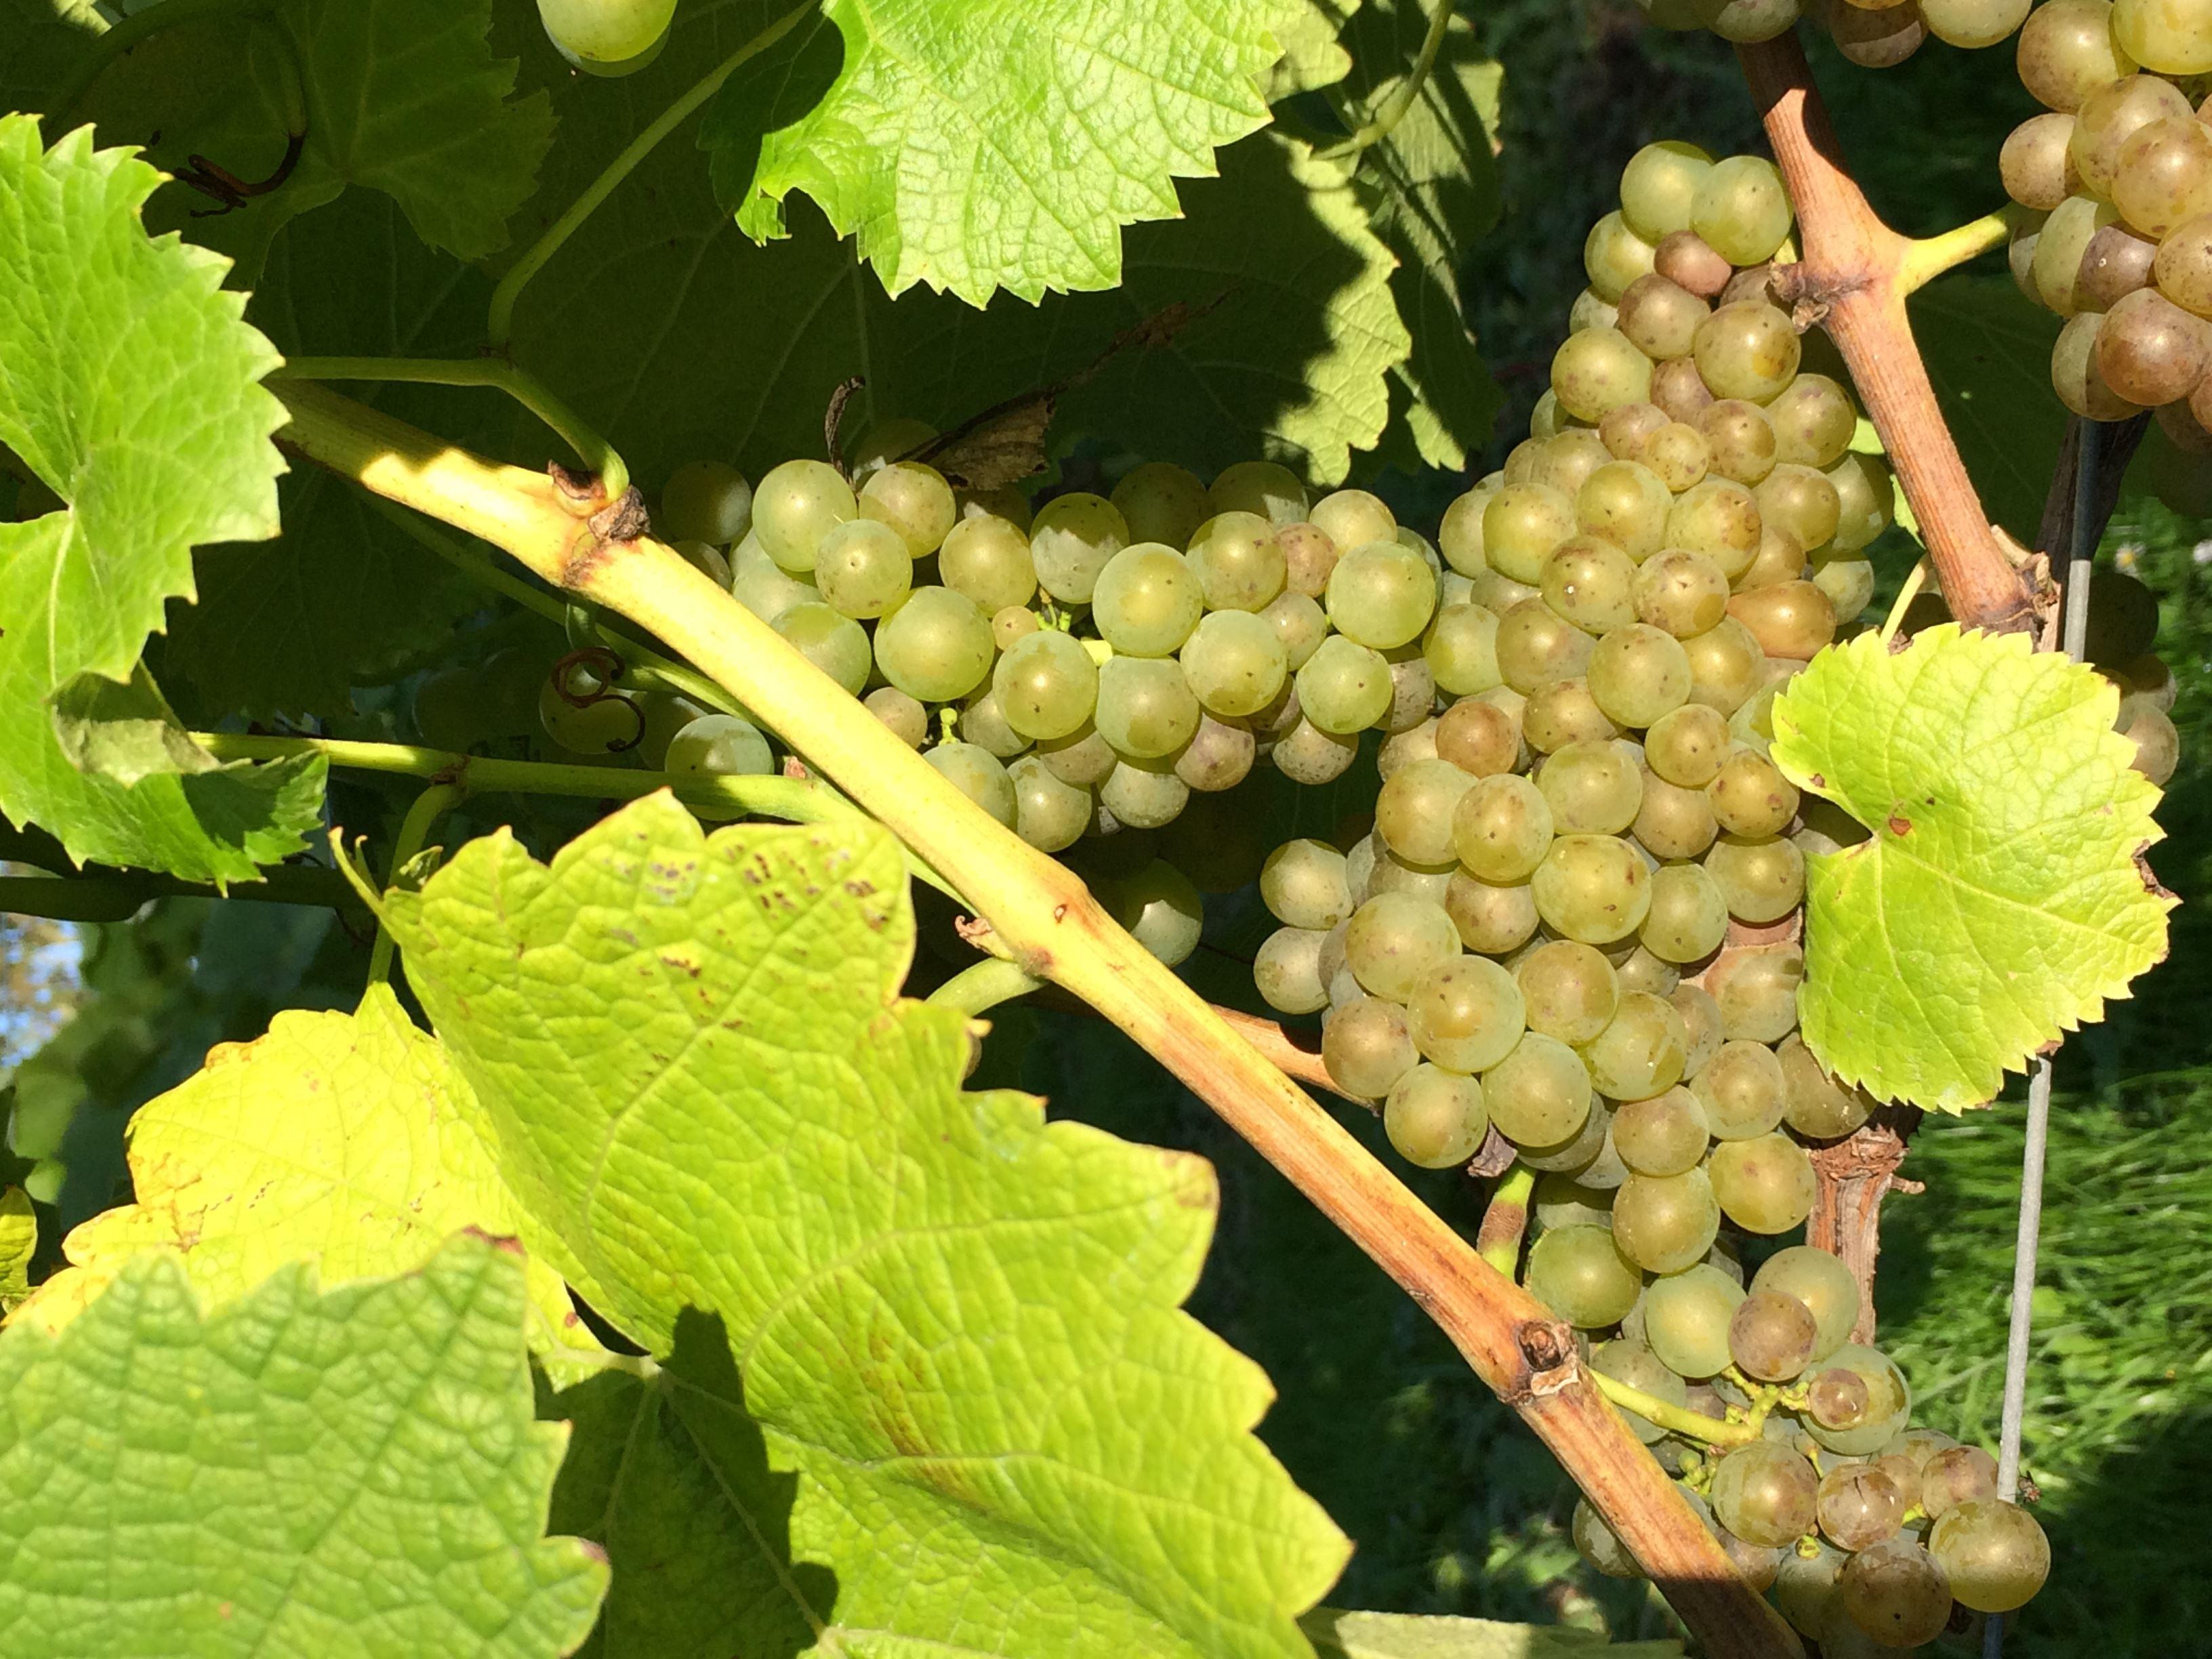 Sydhavsøernes Food Week: Østergaard Vinmageri og Oreby Vineri - Middag